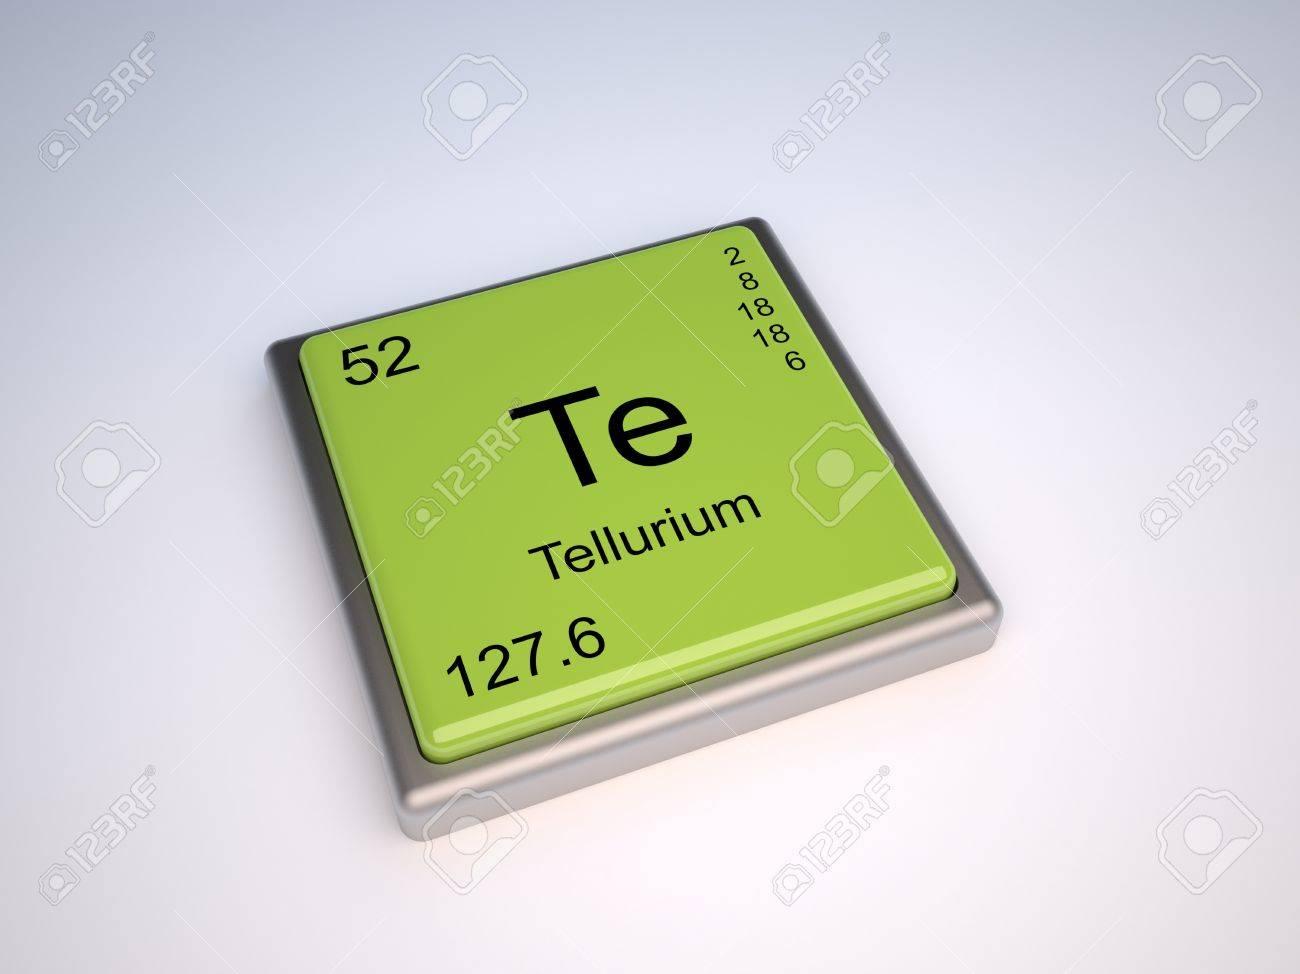 Elemento qumico telurio de la tabla peridica con smbolo te fotos elemento qumico telurio de la tabla peridica con smbolo te foto de archivo 9257103 urtaz Gallery